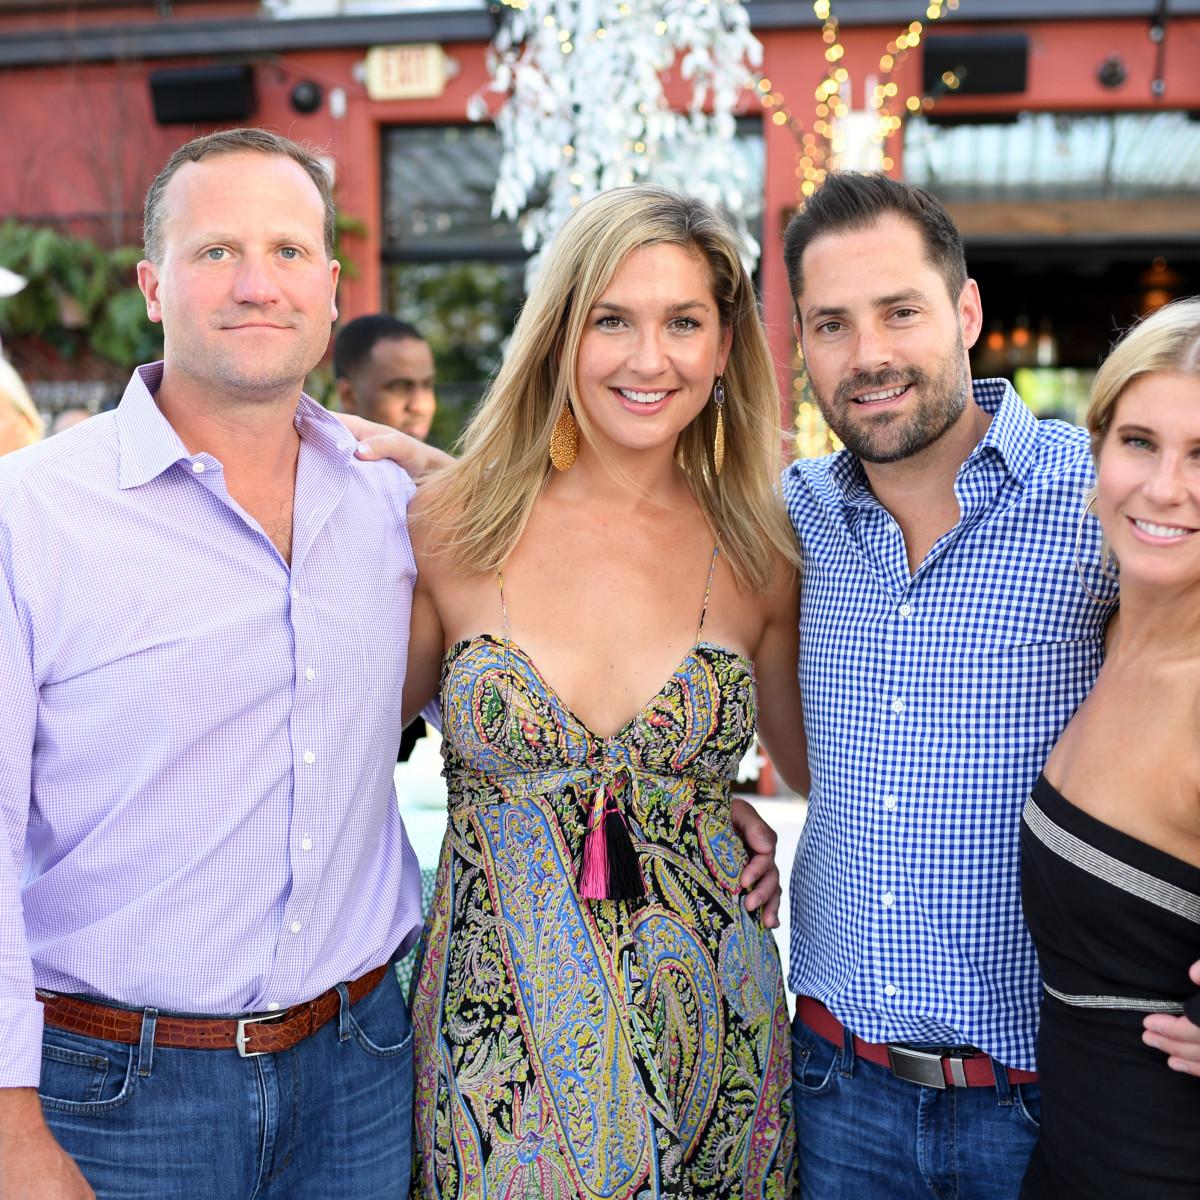 Houston, B&B Butchers & Restaurant Partini with Amschwand Sarcoma Cancer, June 2017, Josh Oren, Lisa Oren, Jay Fields, Allie Fields